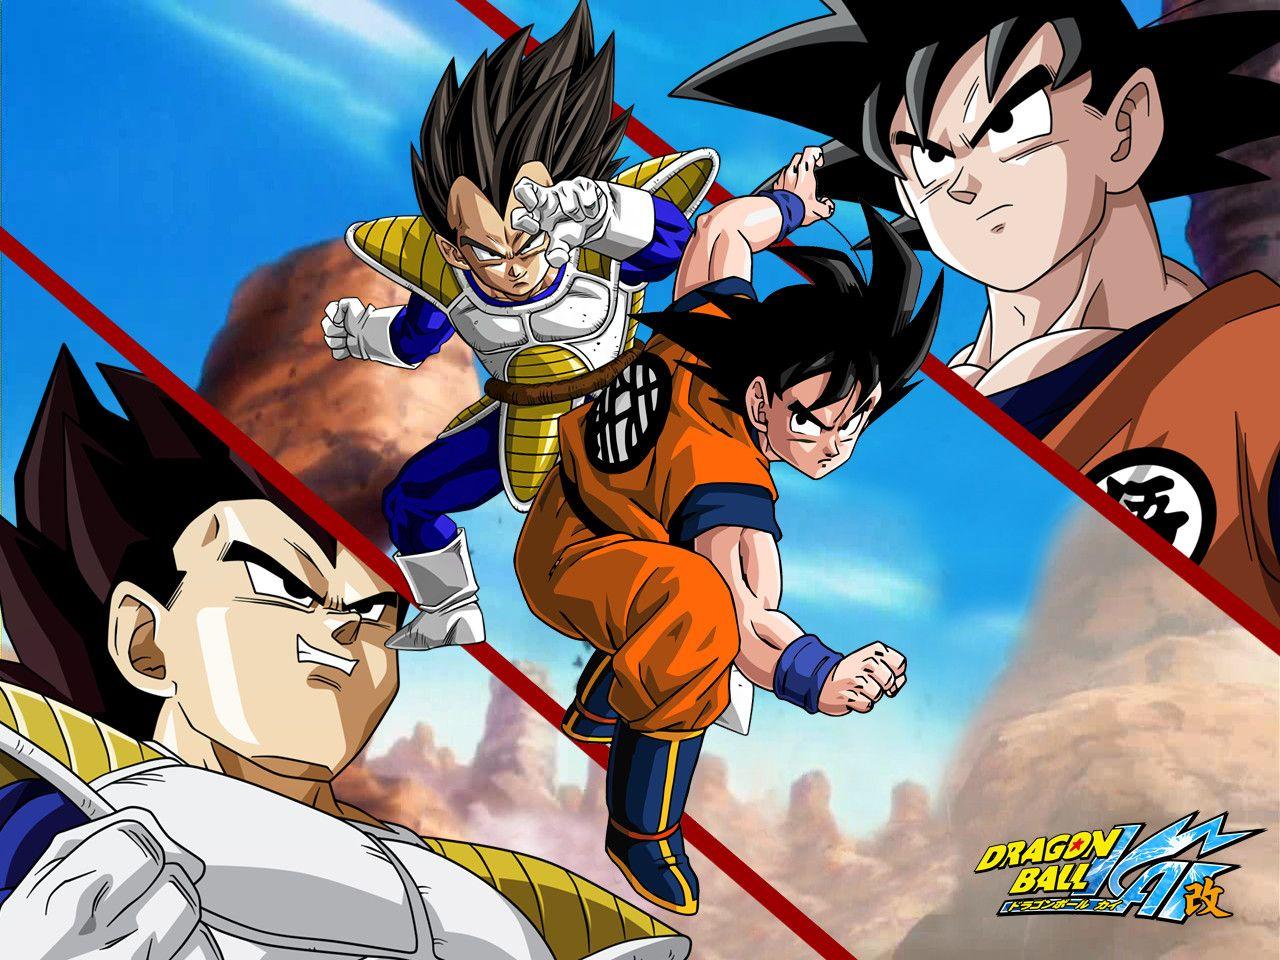 Wallpapers De Vegeta En Hd Dragon Ball Goku Dragon Ball Wallpaper Iphone Dragon Ball Art